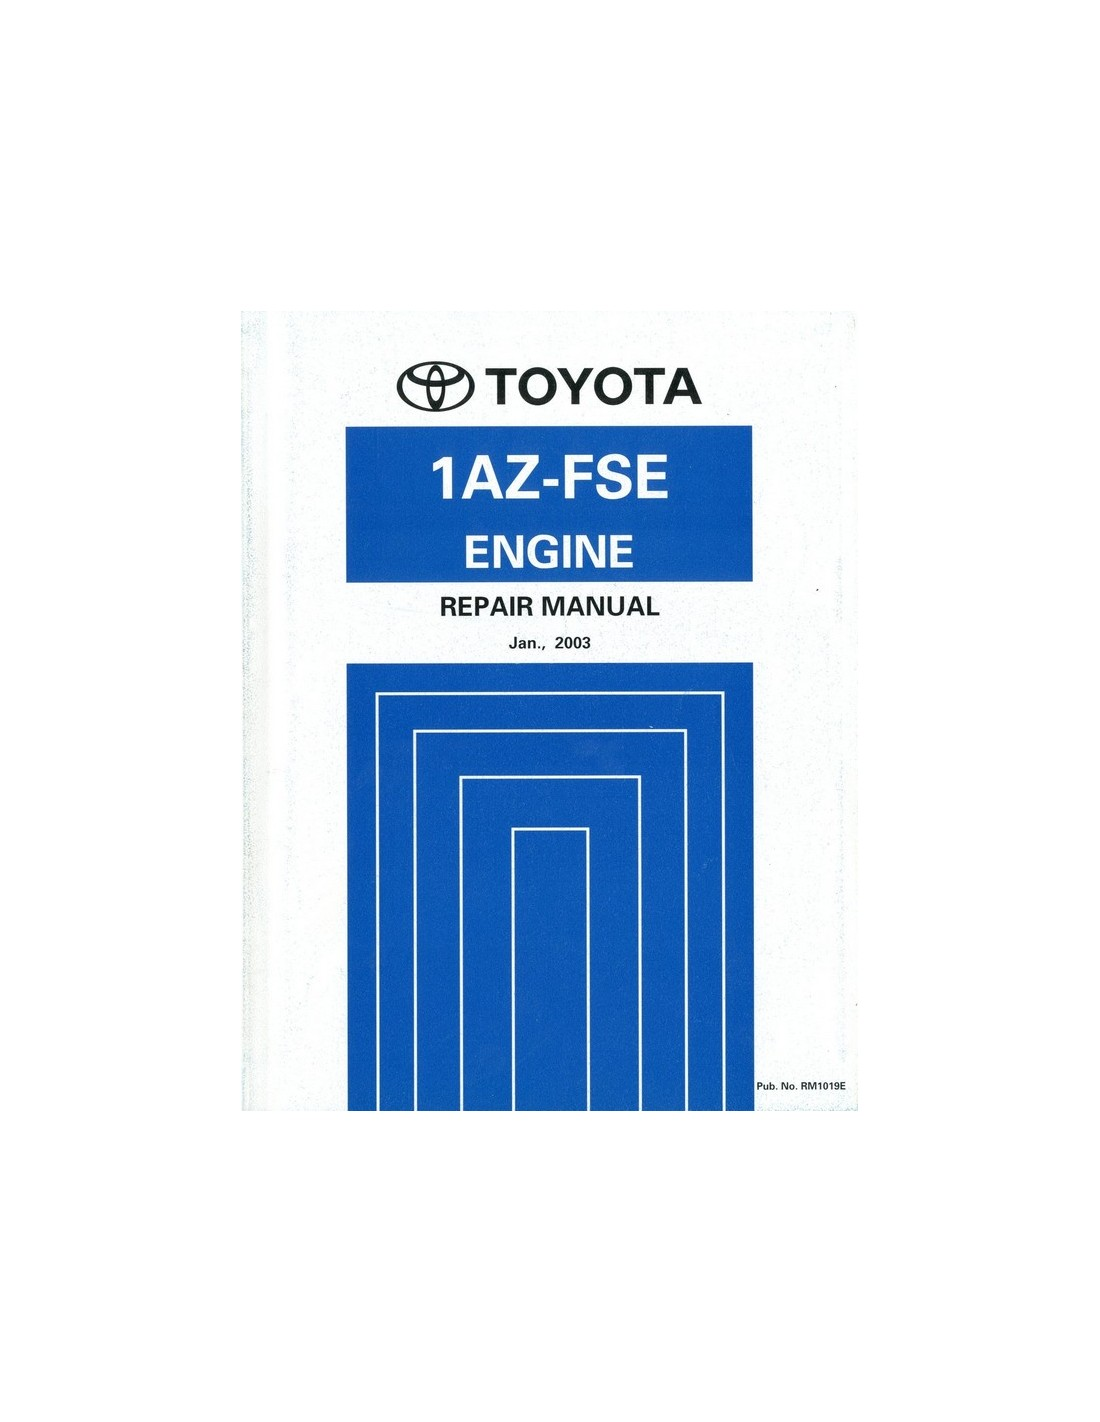 2003 toyota avensis 1az fse engine repair manual english rh autolit eu Toyota 2.4 Liter Engine 1az fse engine toyota repair manual